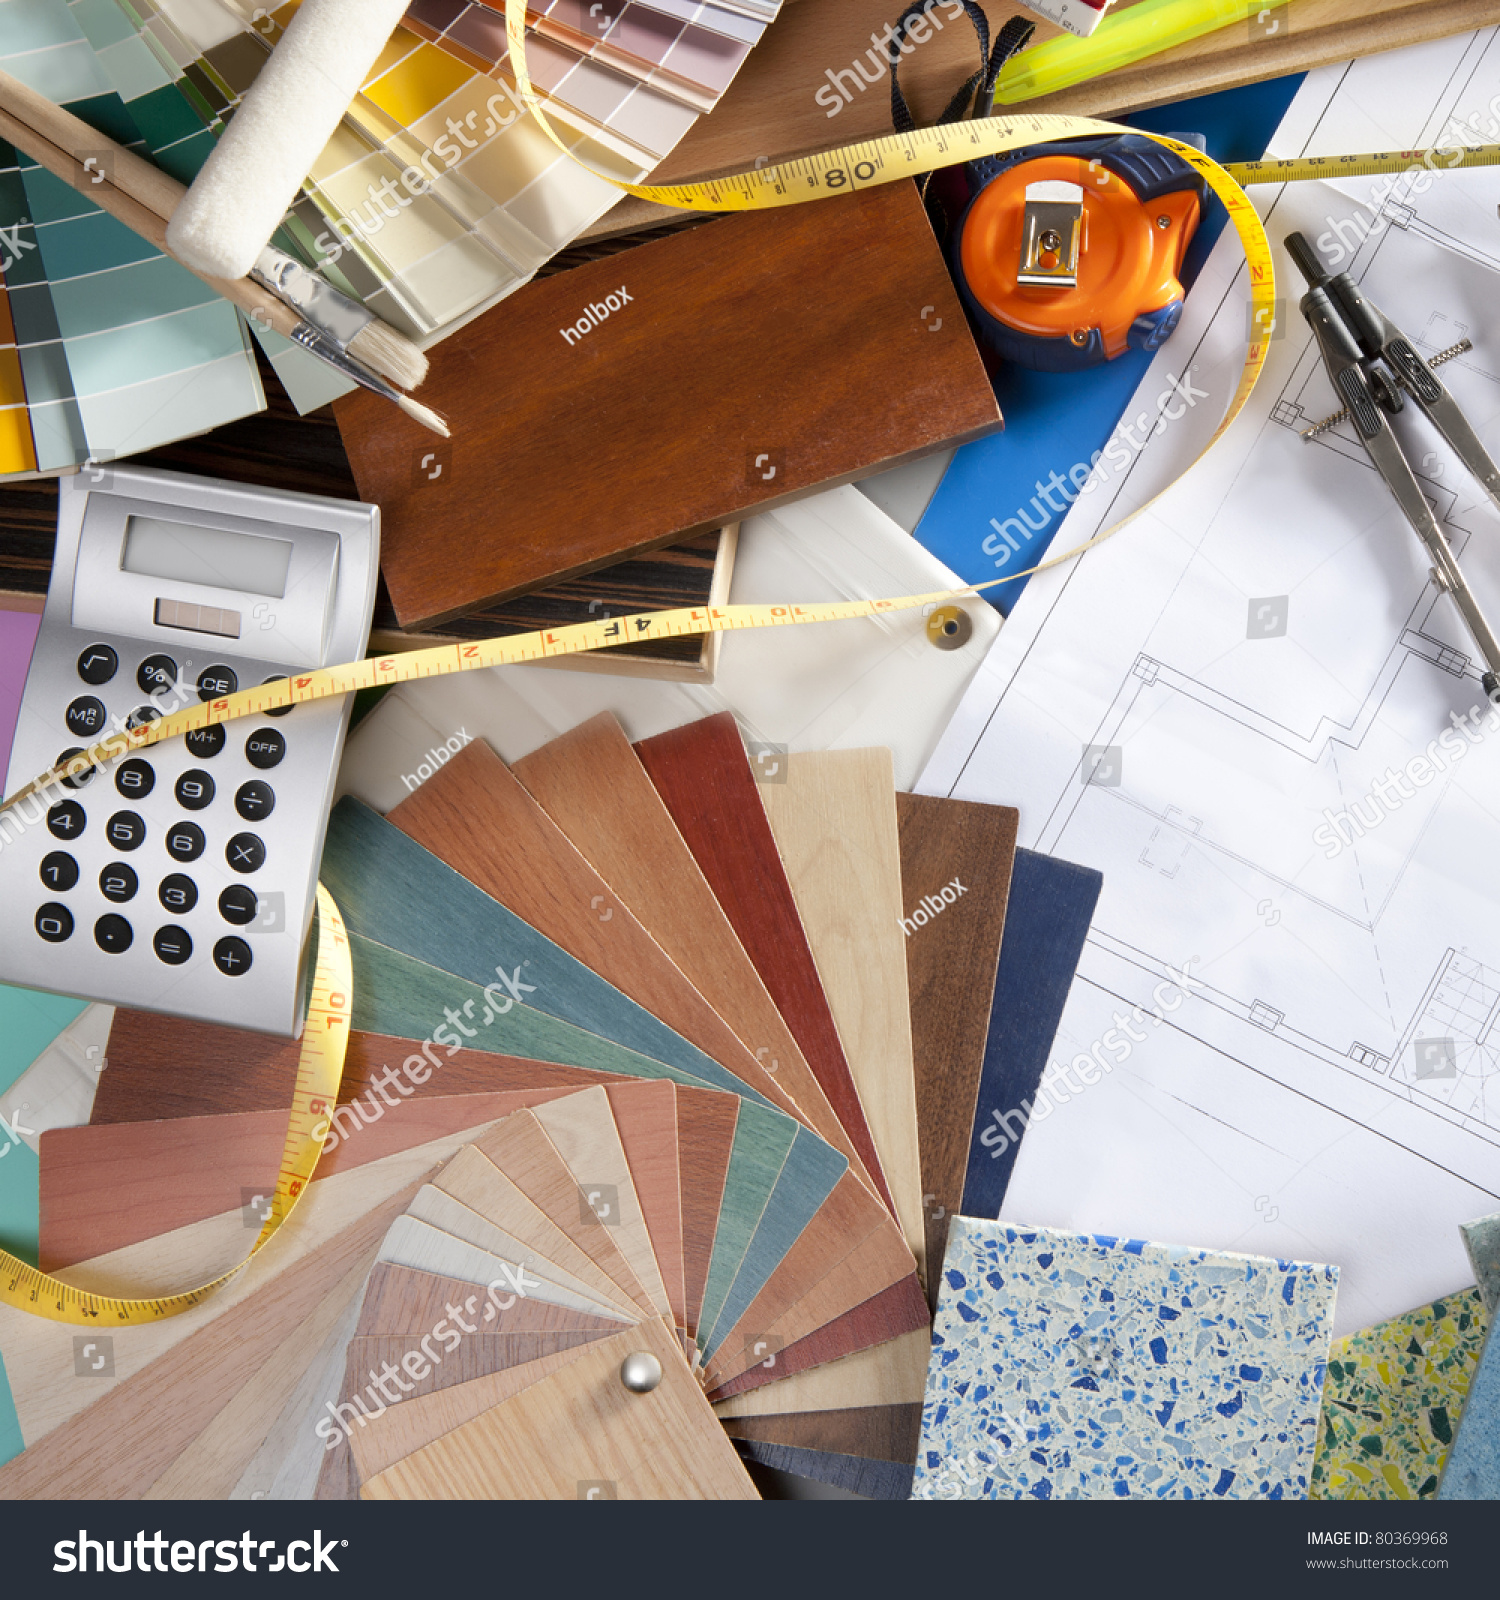 rchitect Interior Designer Workplace Desk Design Stock Photo ... - ^